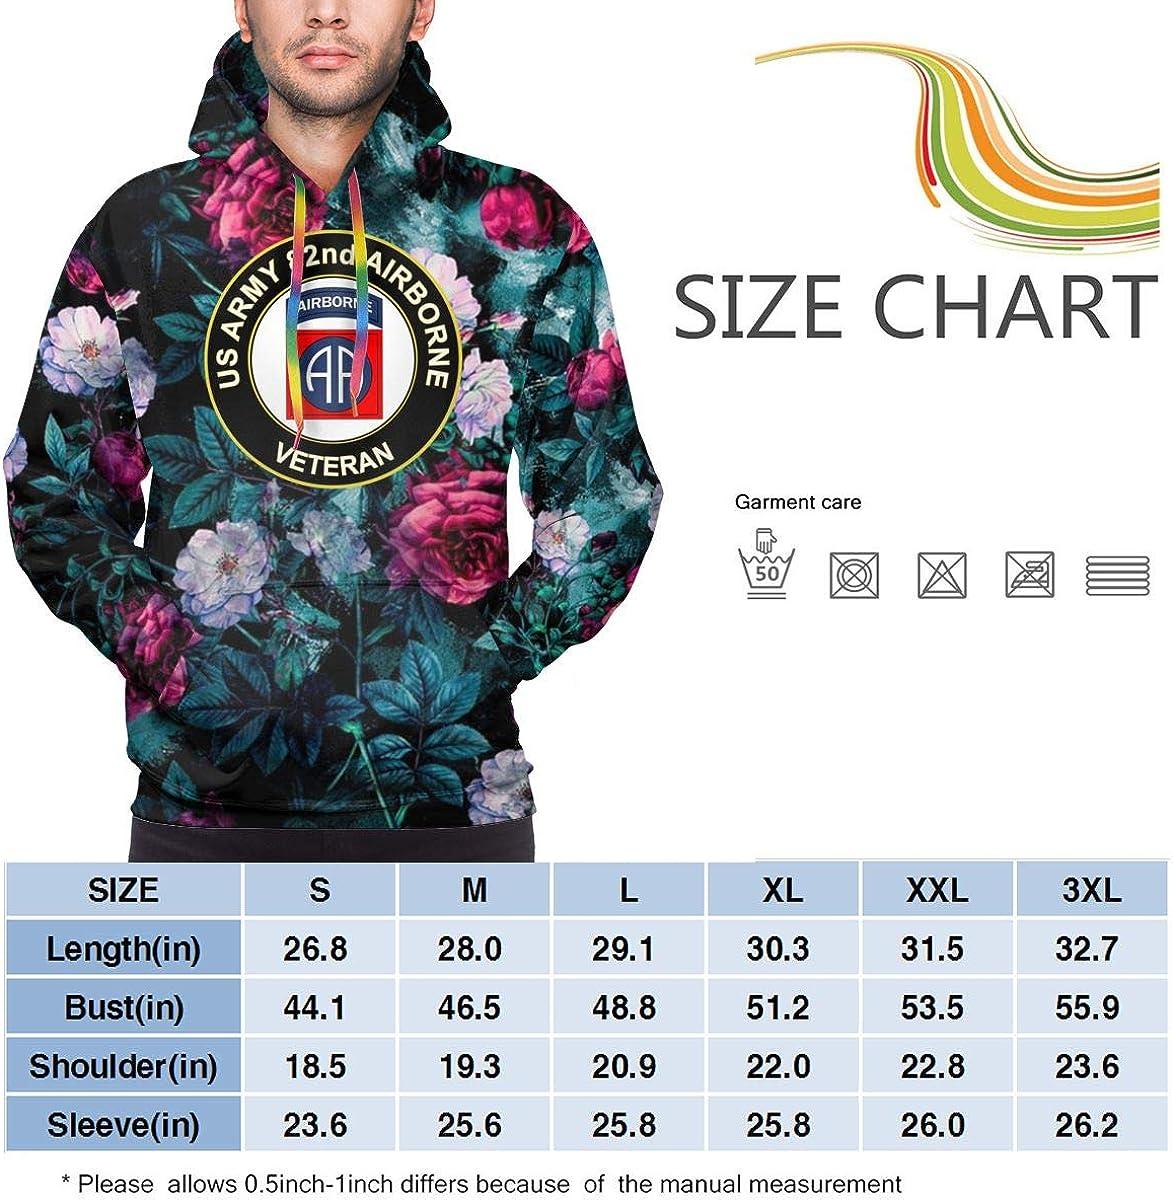 MUSICOT Mens Athletic Pullover Cozy Sport Outwear US Army Veteran 82nd Airborne Sweatshirt Hoodies